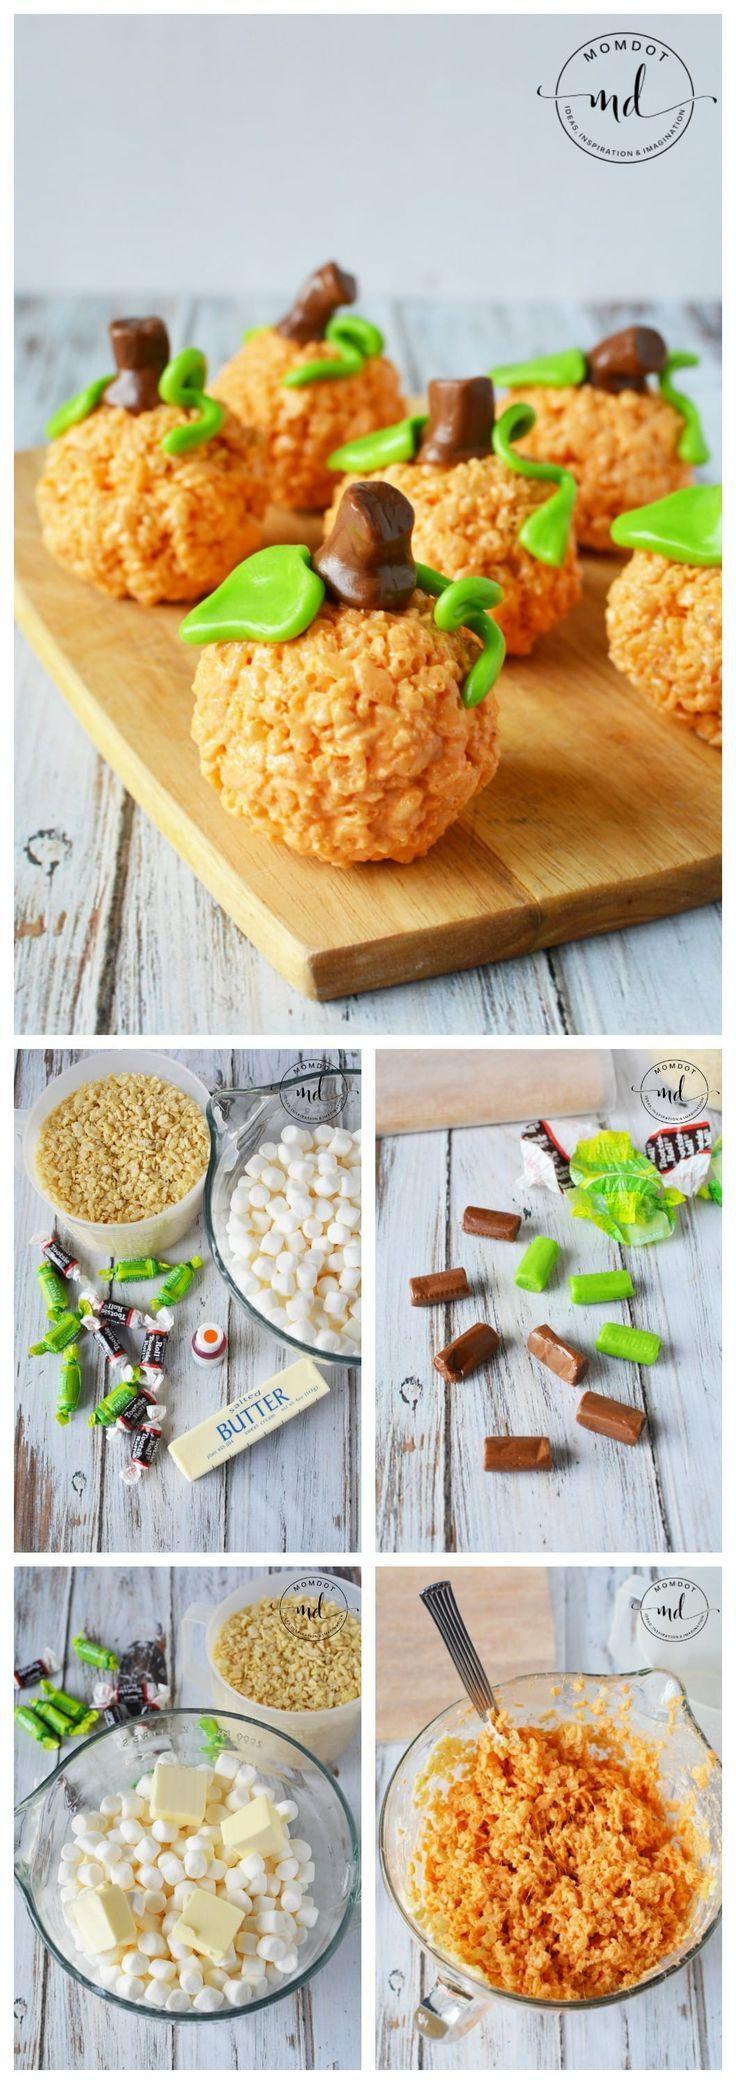 Pumpkin Rice Krispie Treats Recipe, How to make Pumpkin rice krispie treats with tootsie roll stump and leaves #recipe #ricekrispies #tutorial #thanksgiving #halloween #howto #DIY